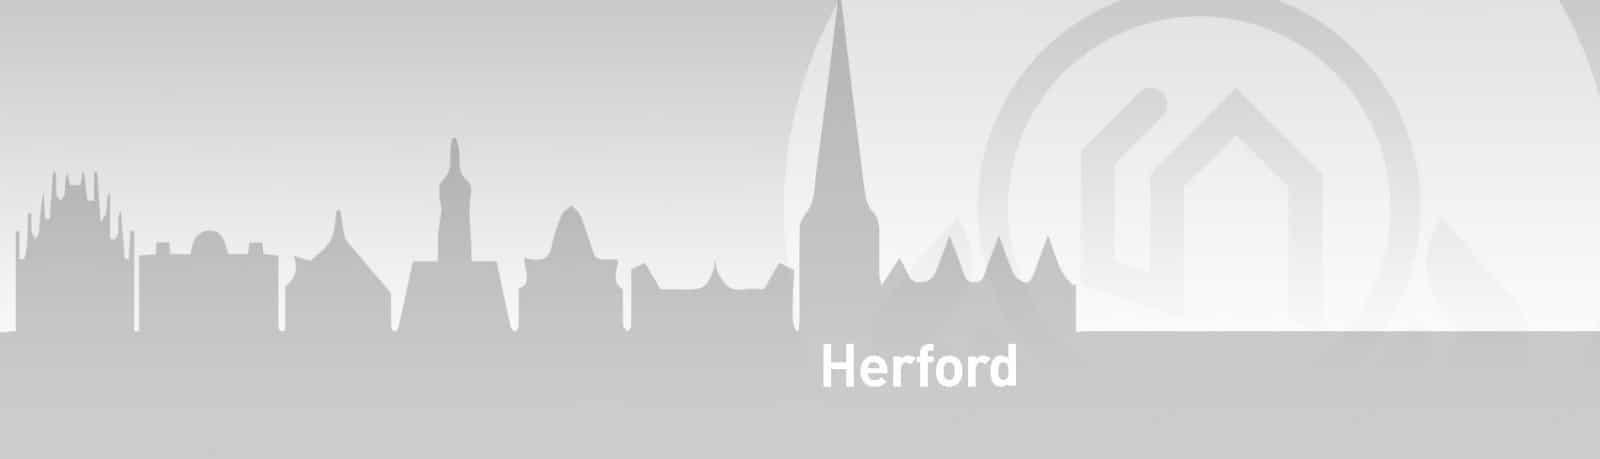 Herford SENCURINA 1904x546 - Kalender Herford